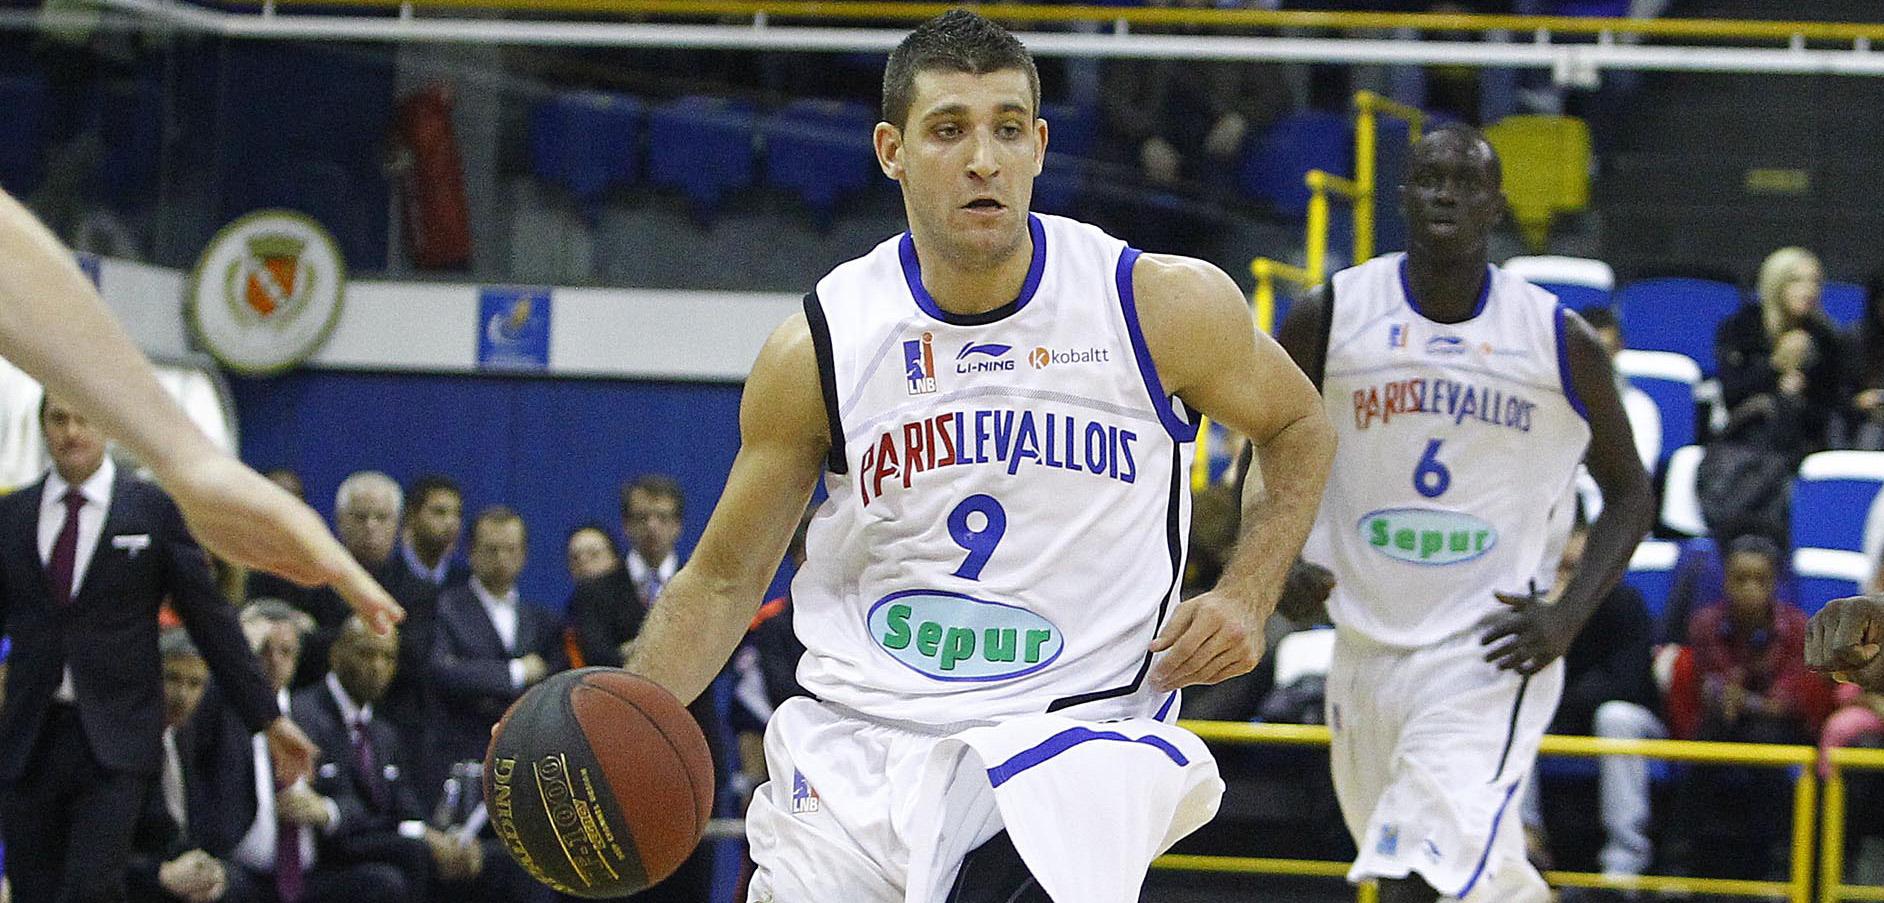 Basketball: Paris Levallois vs CAI Zaragoza en direct live streaming